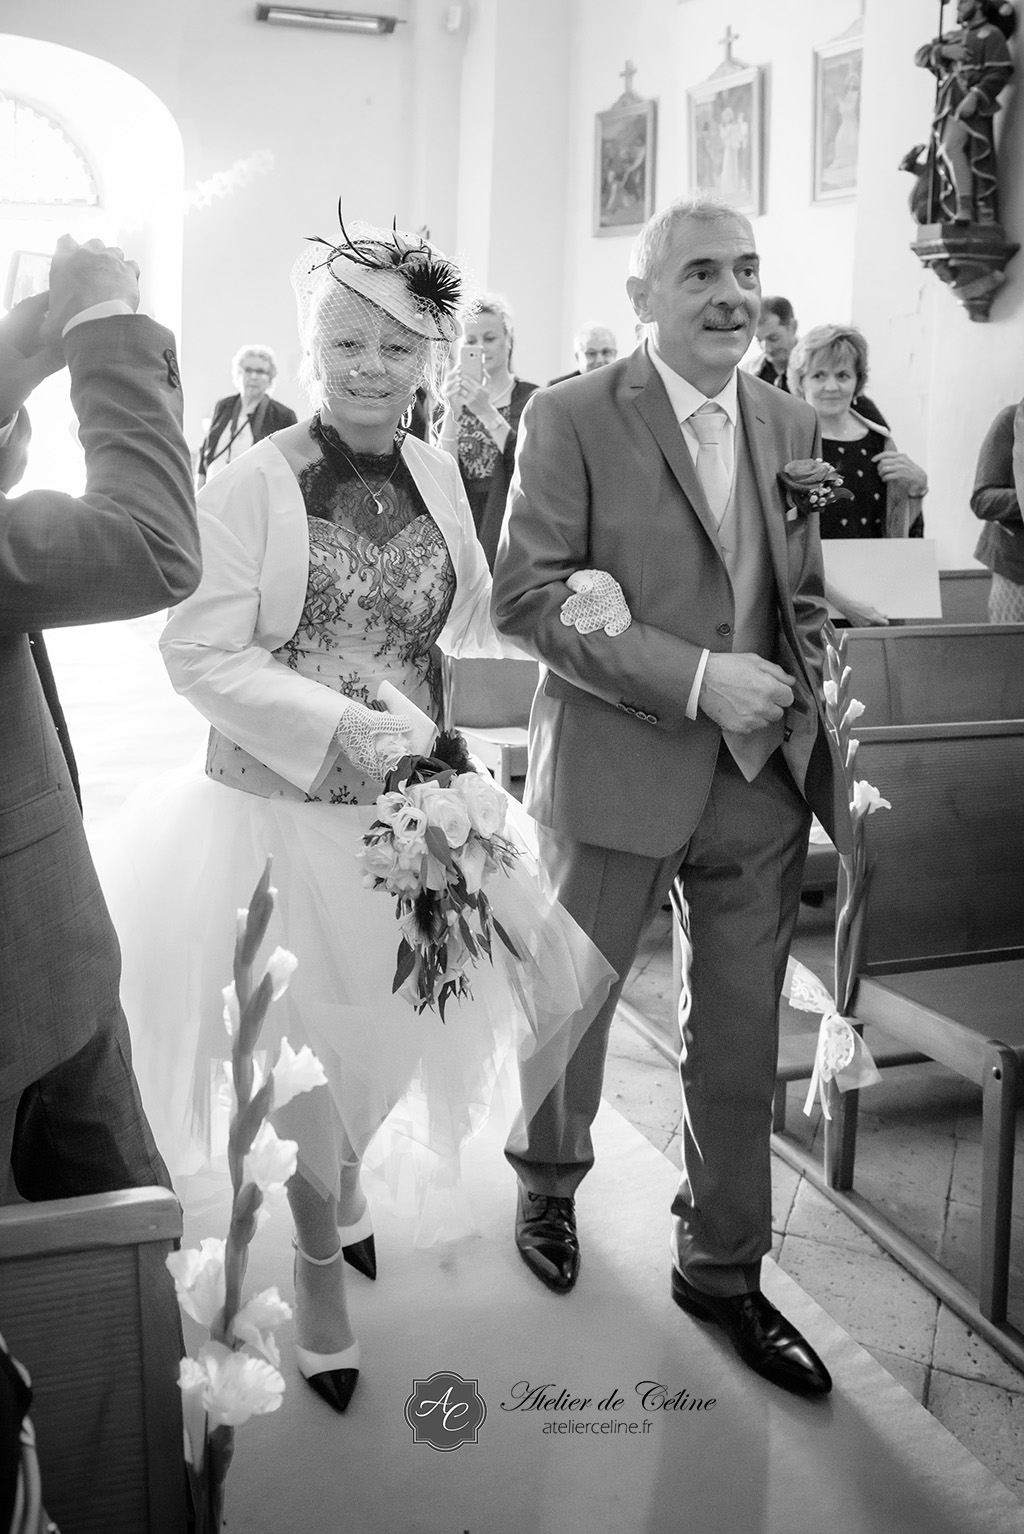 Mariage, cérémonie religieuse, église, couple (4)